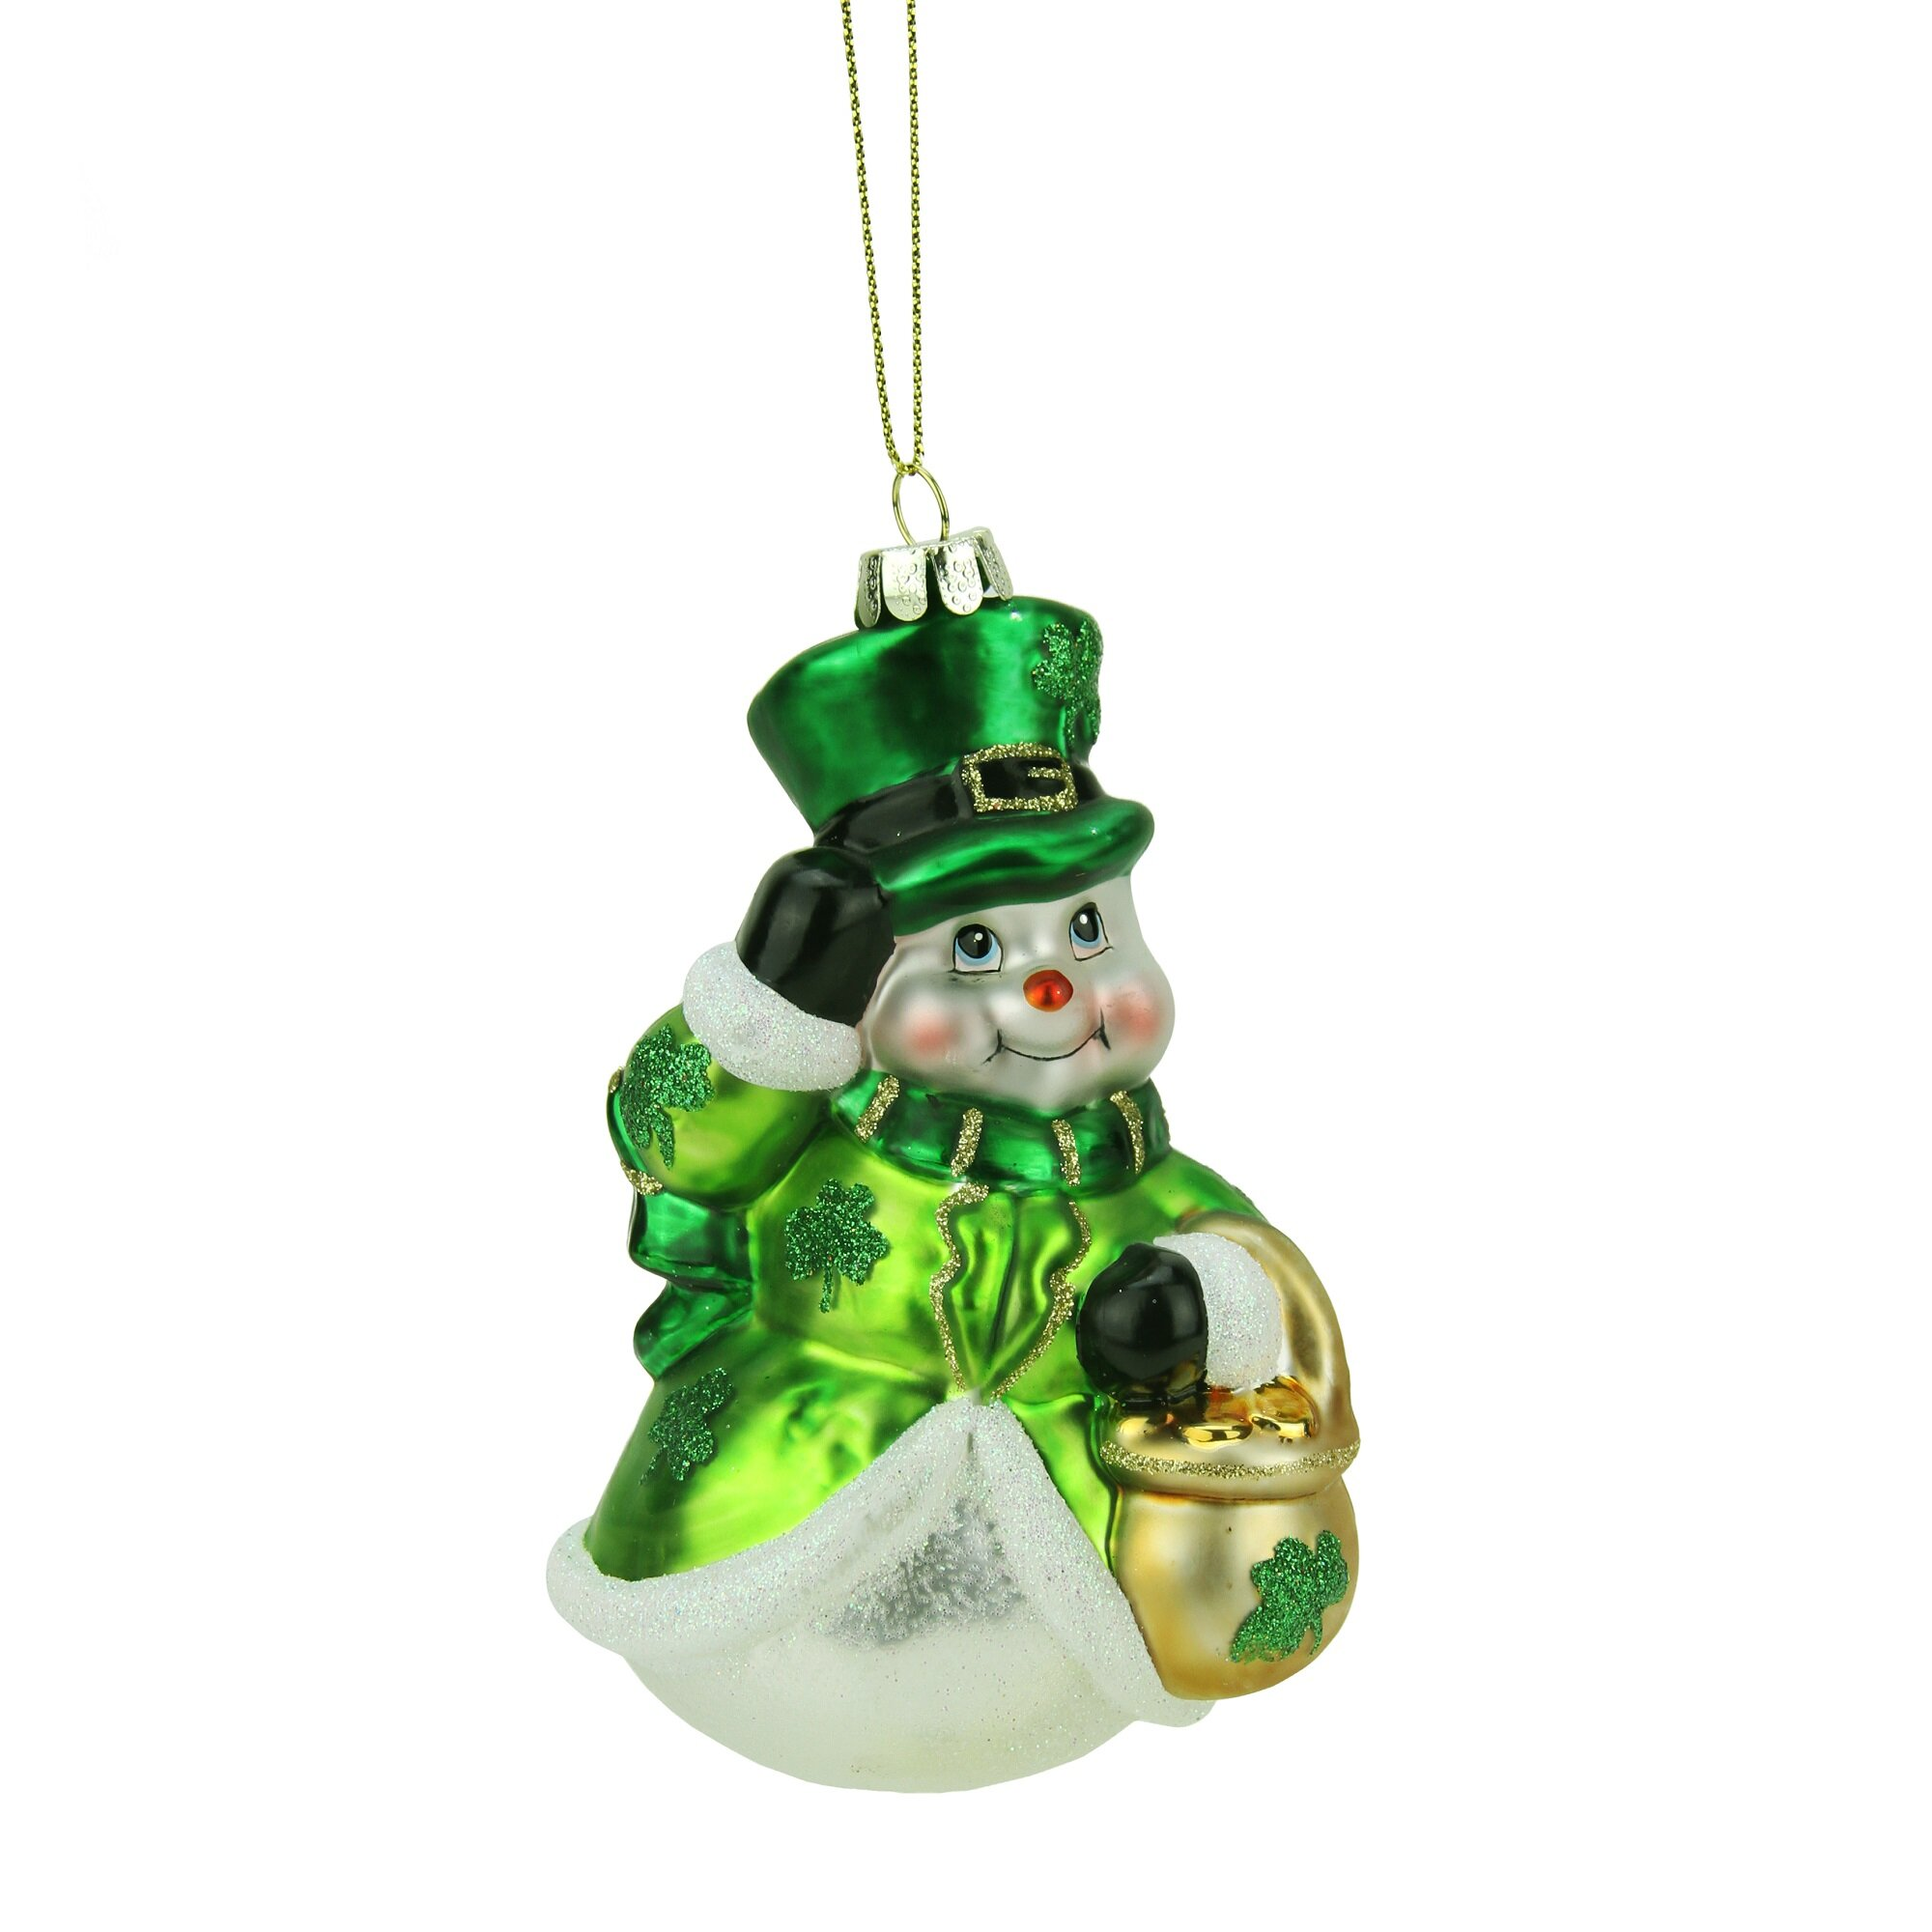 Northlight luck of the irish glittered snowman glass